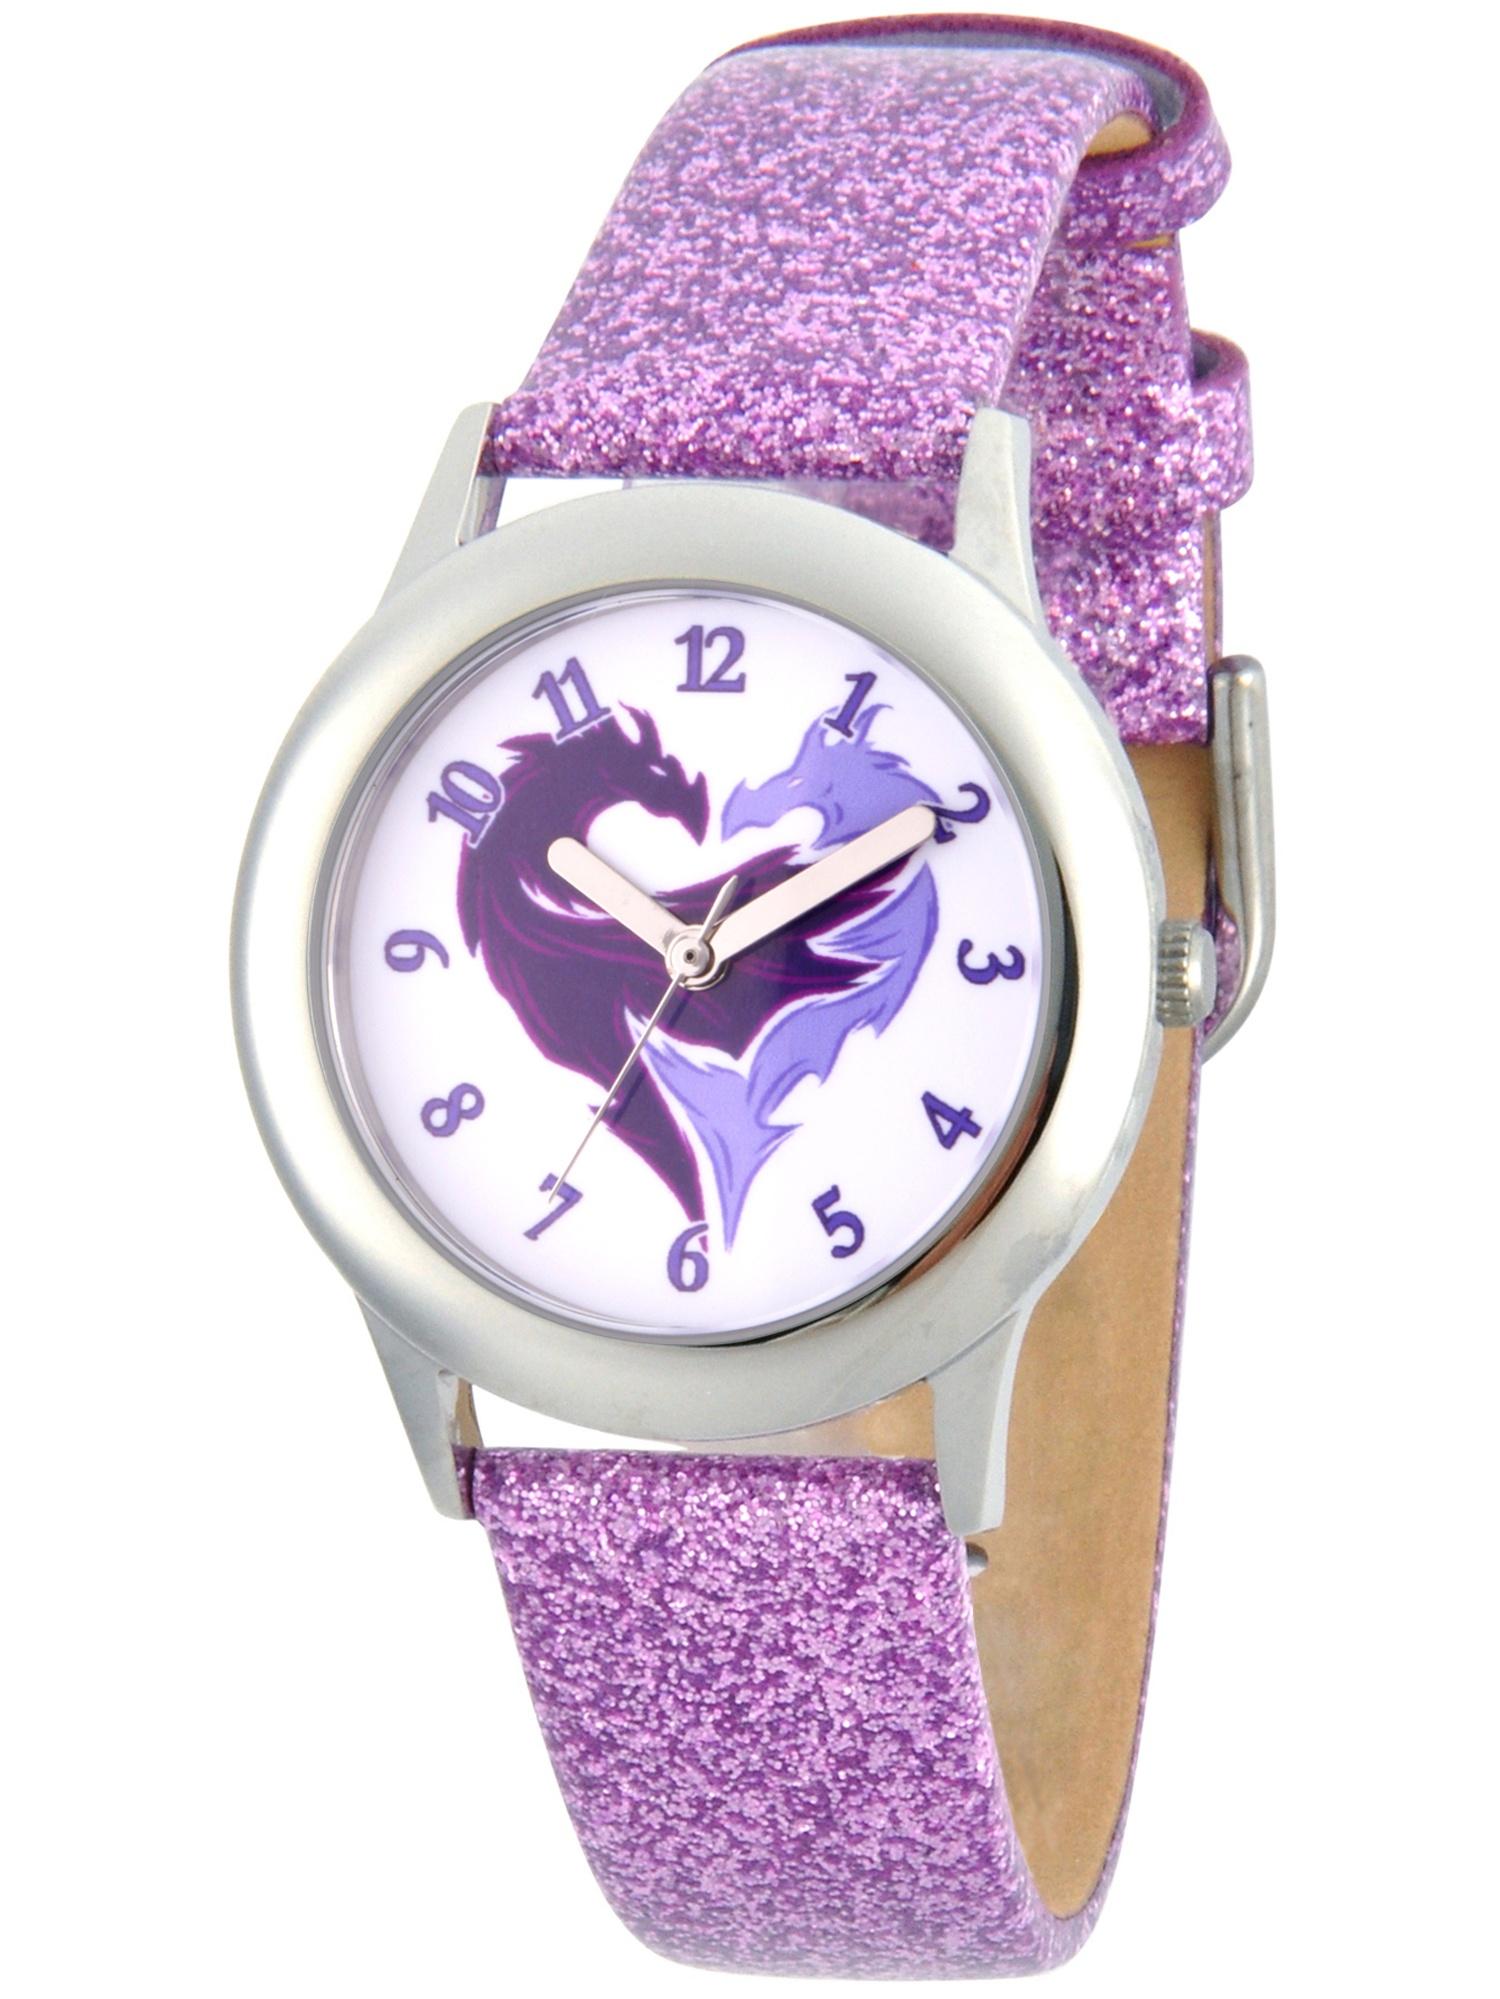 Descendants 2 Mal Icon Girls' Stainless Steel Watch, Purple Glitter Strap